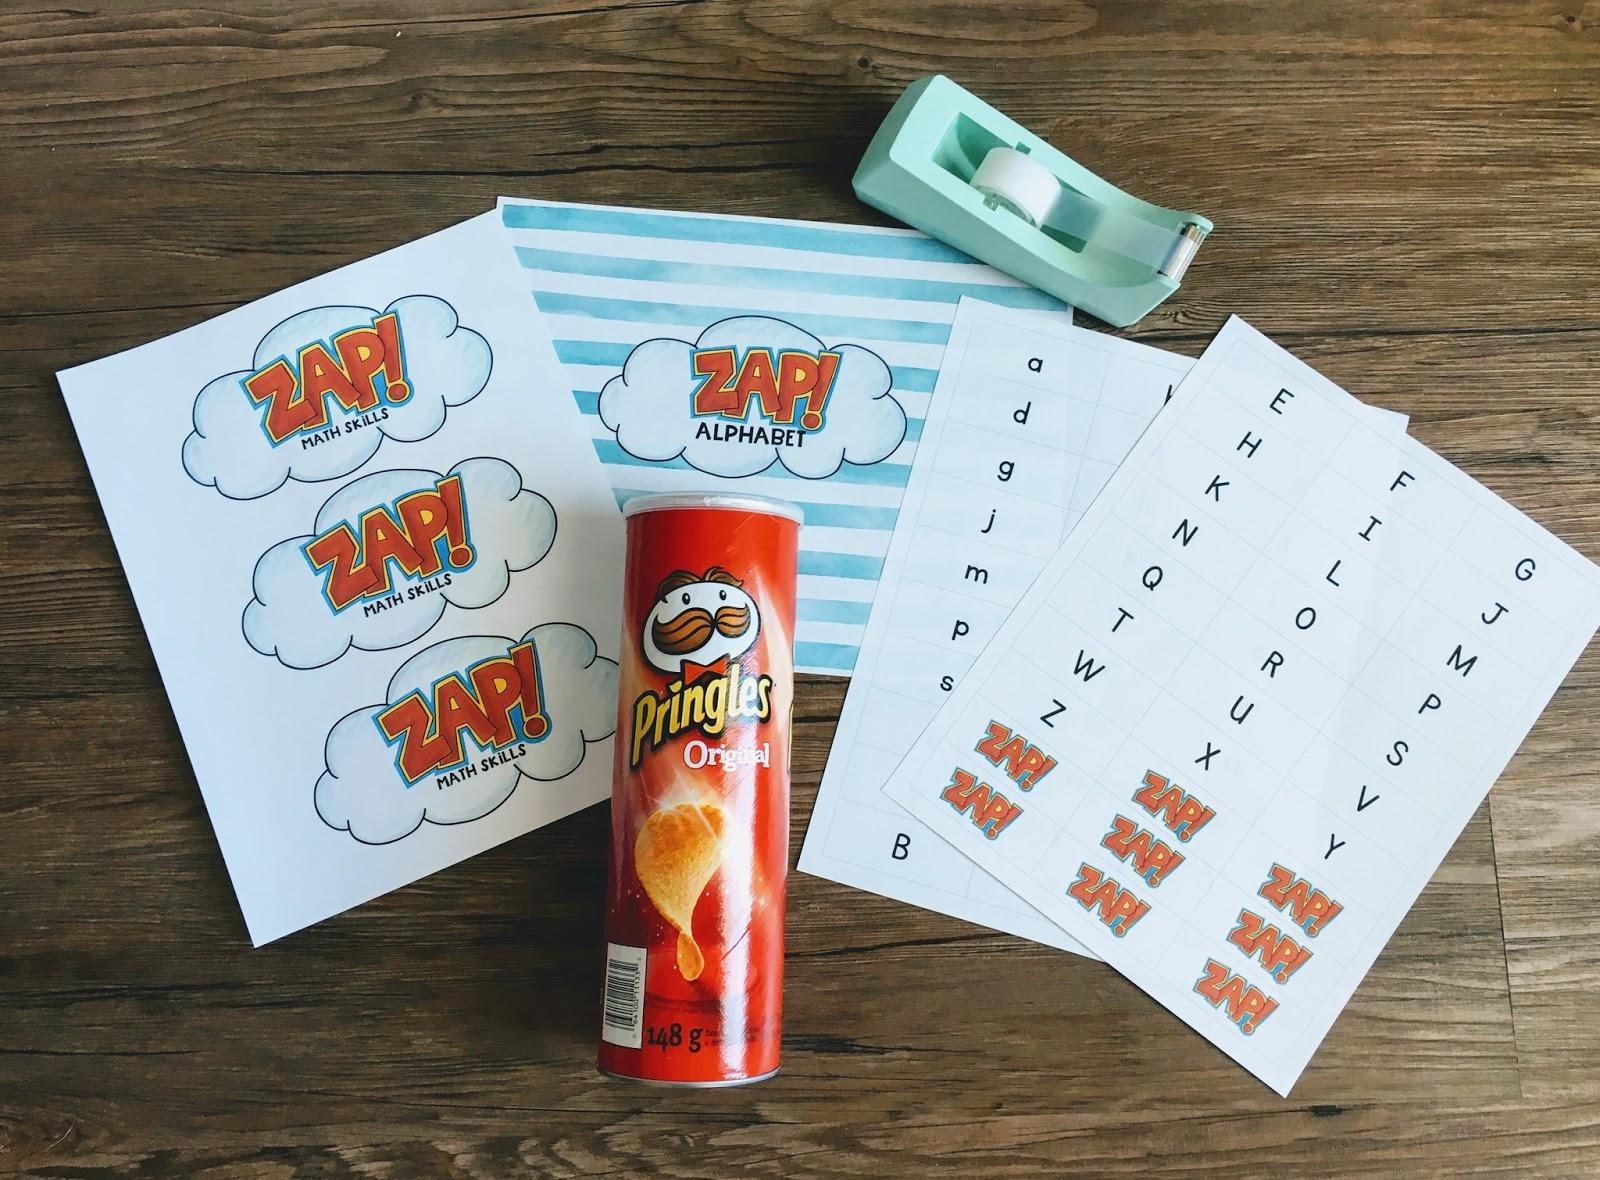 Minimalist Classroom Activities ~ Zap literacy games in the classroom a minimalist teacher